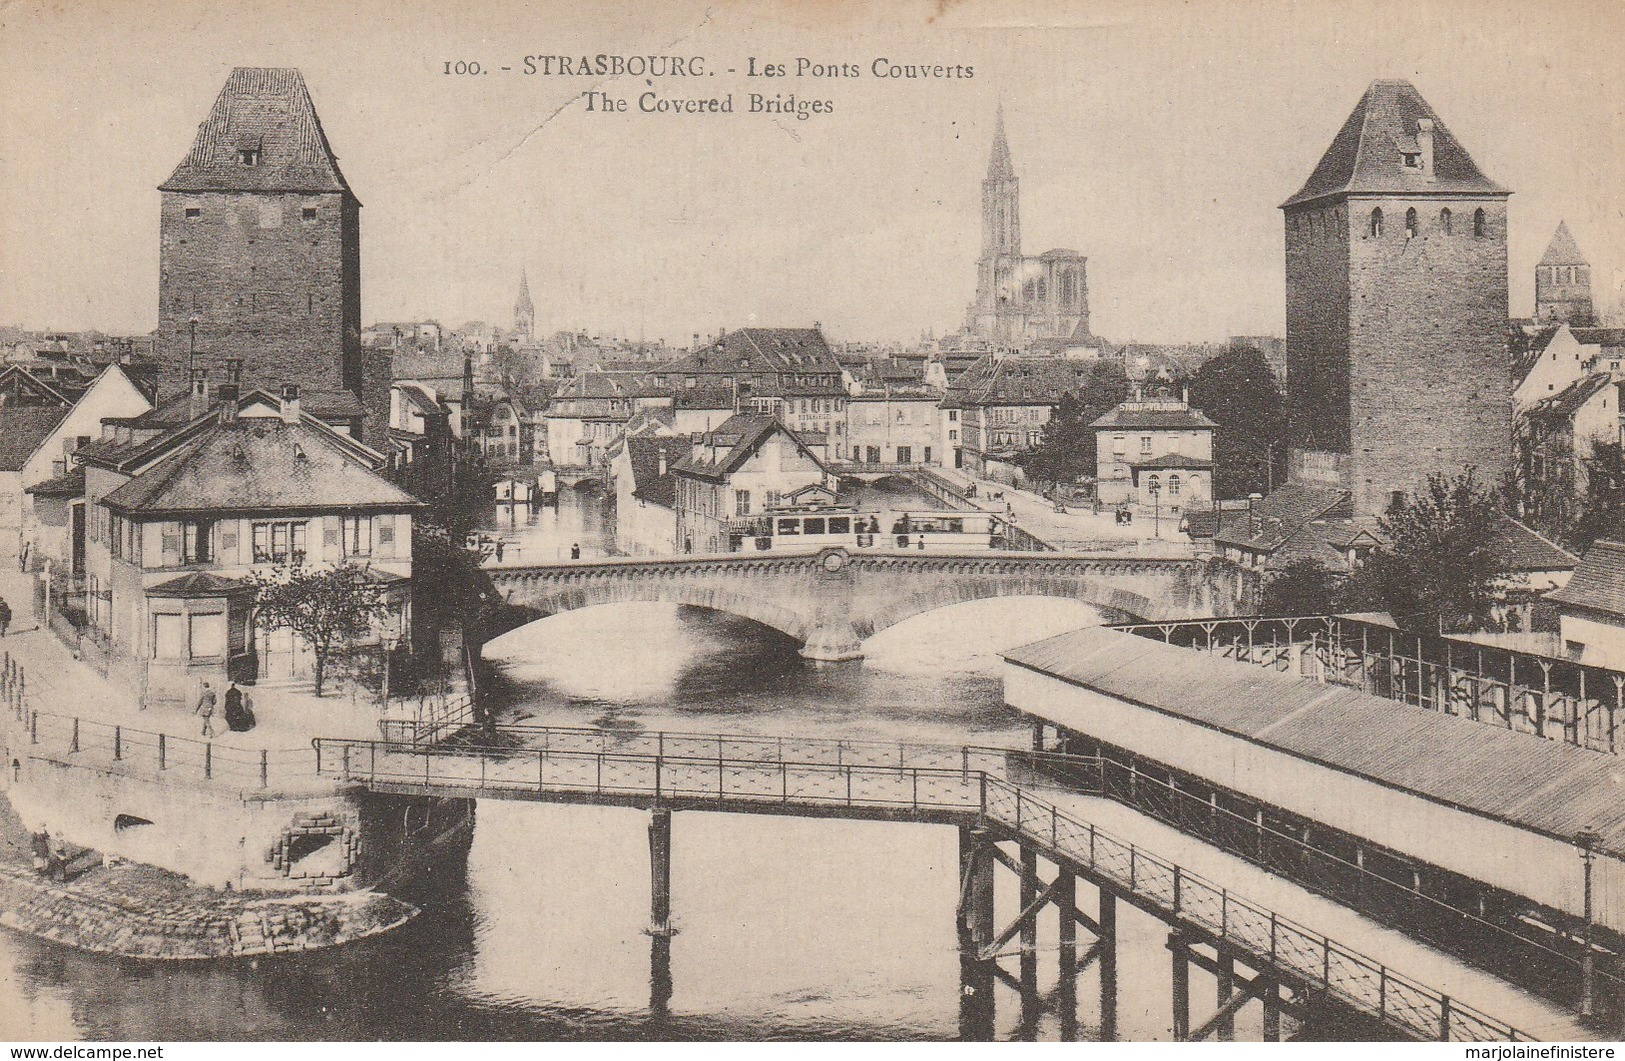 Dép. 67 - Strasbourg. - Les Ponts Couverts. Tramway. Ed. Ch Bergeret. N°100 - Strasbourg